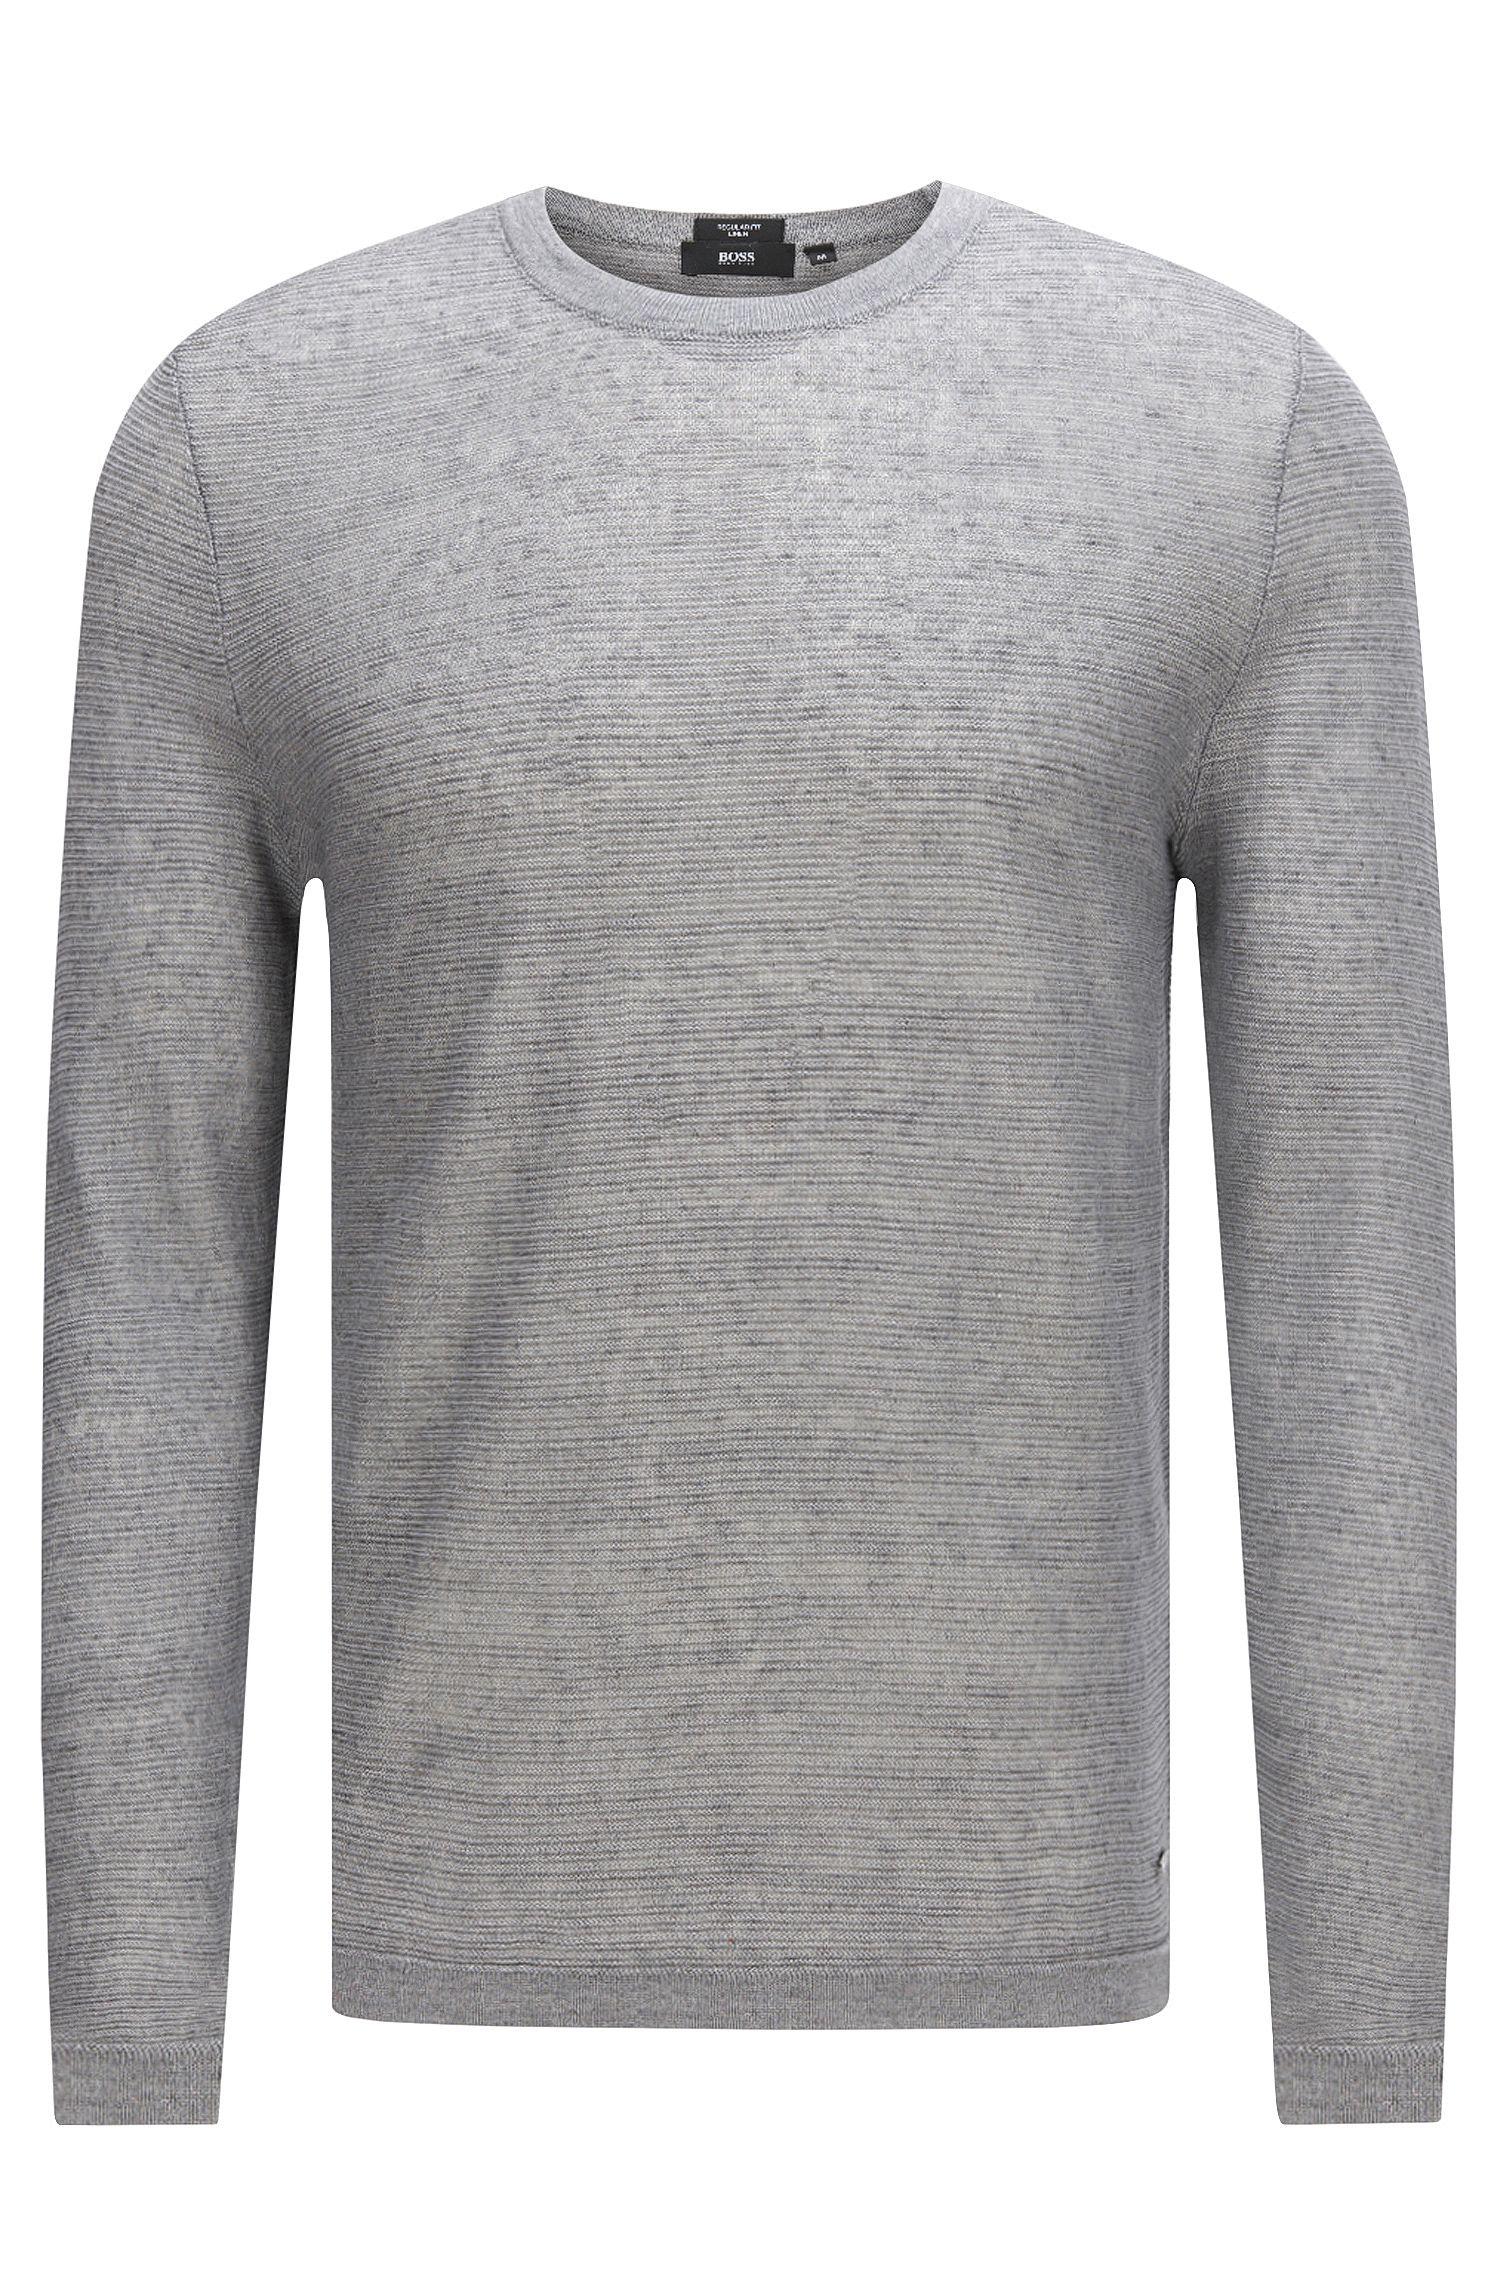 'Ollivio' | Linen Fine Ribbed Sweater